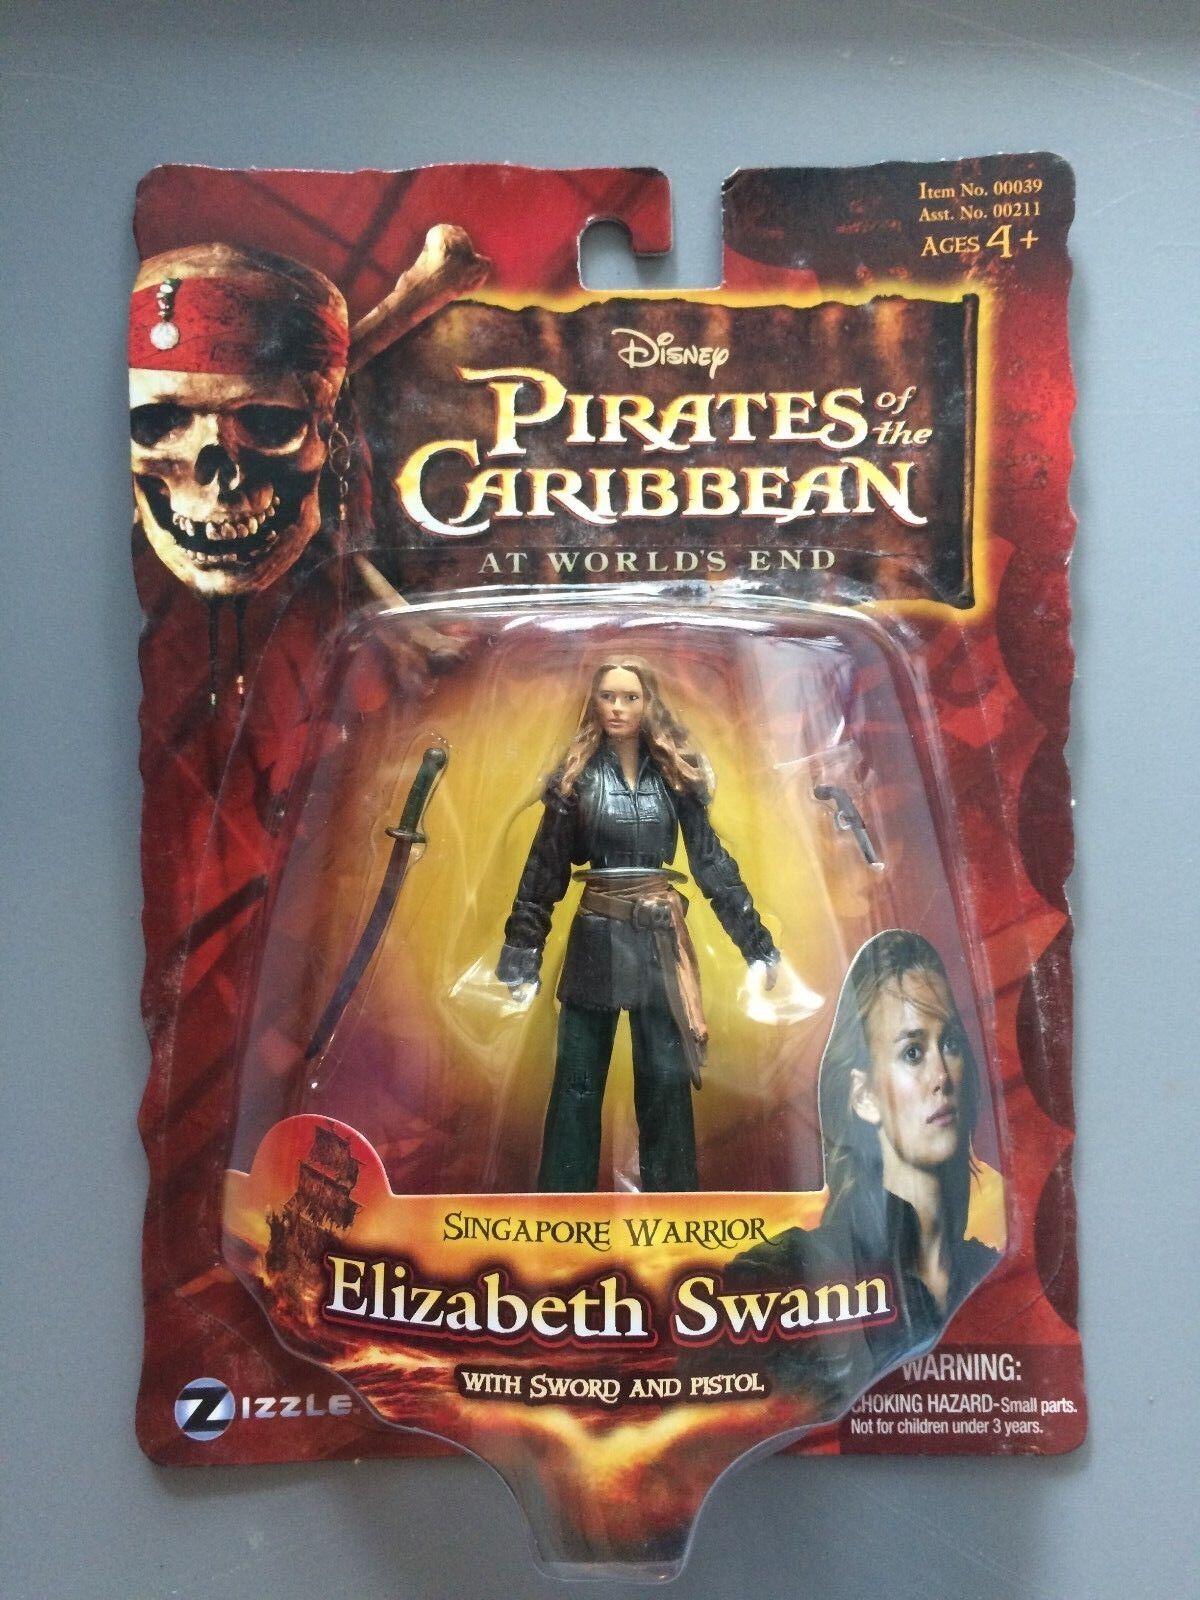 Sizzle Pirates of the bilibbean I värld's End Singapore Warrior Elisabath SWANN